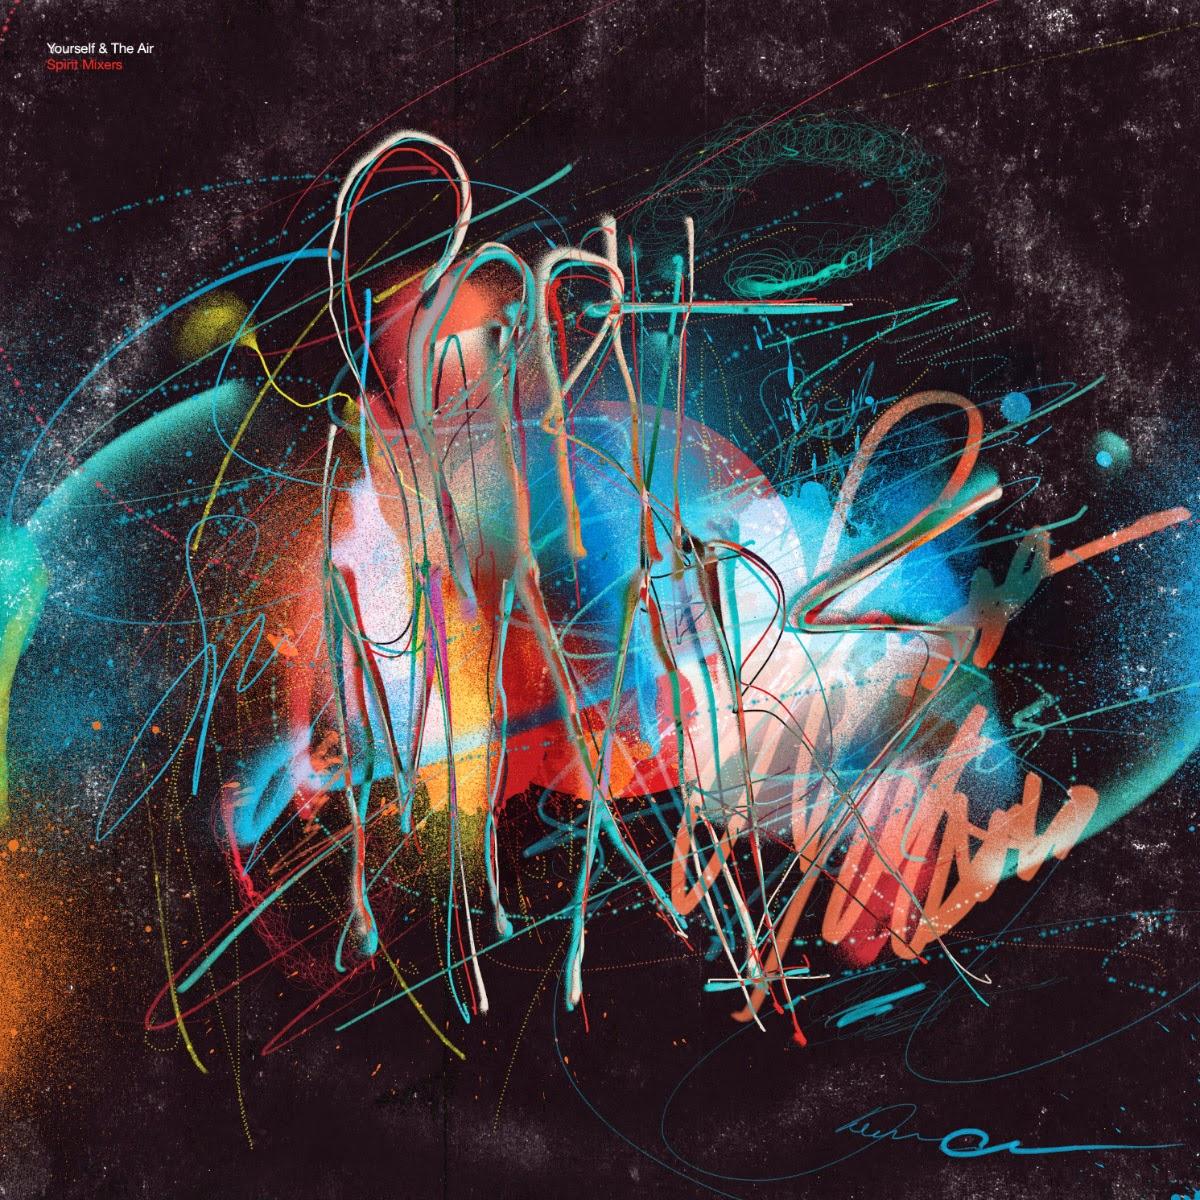 Nigel Evan Dennis - Graphic Design